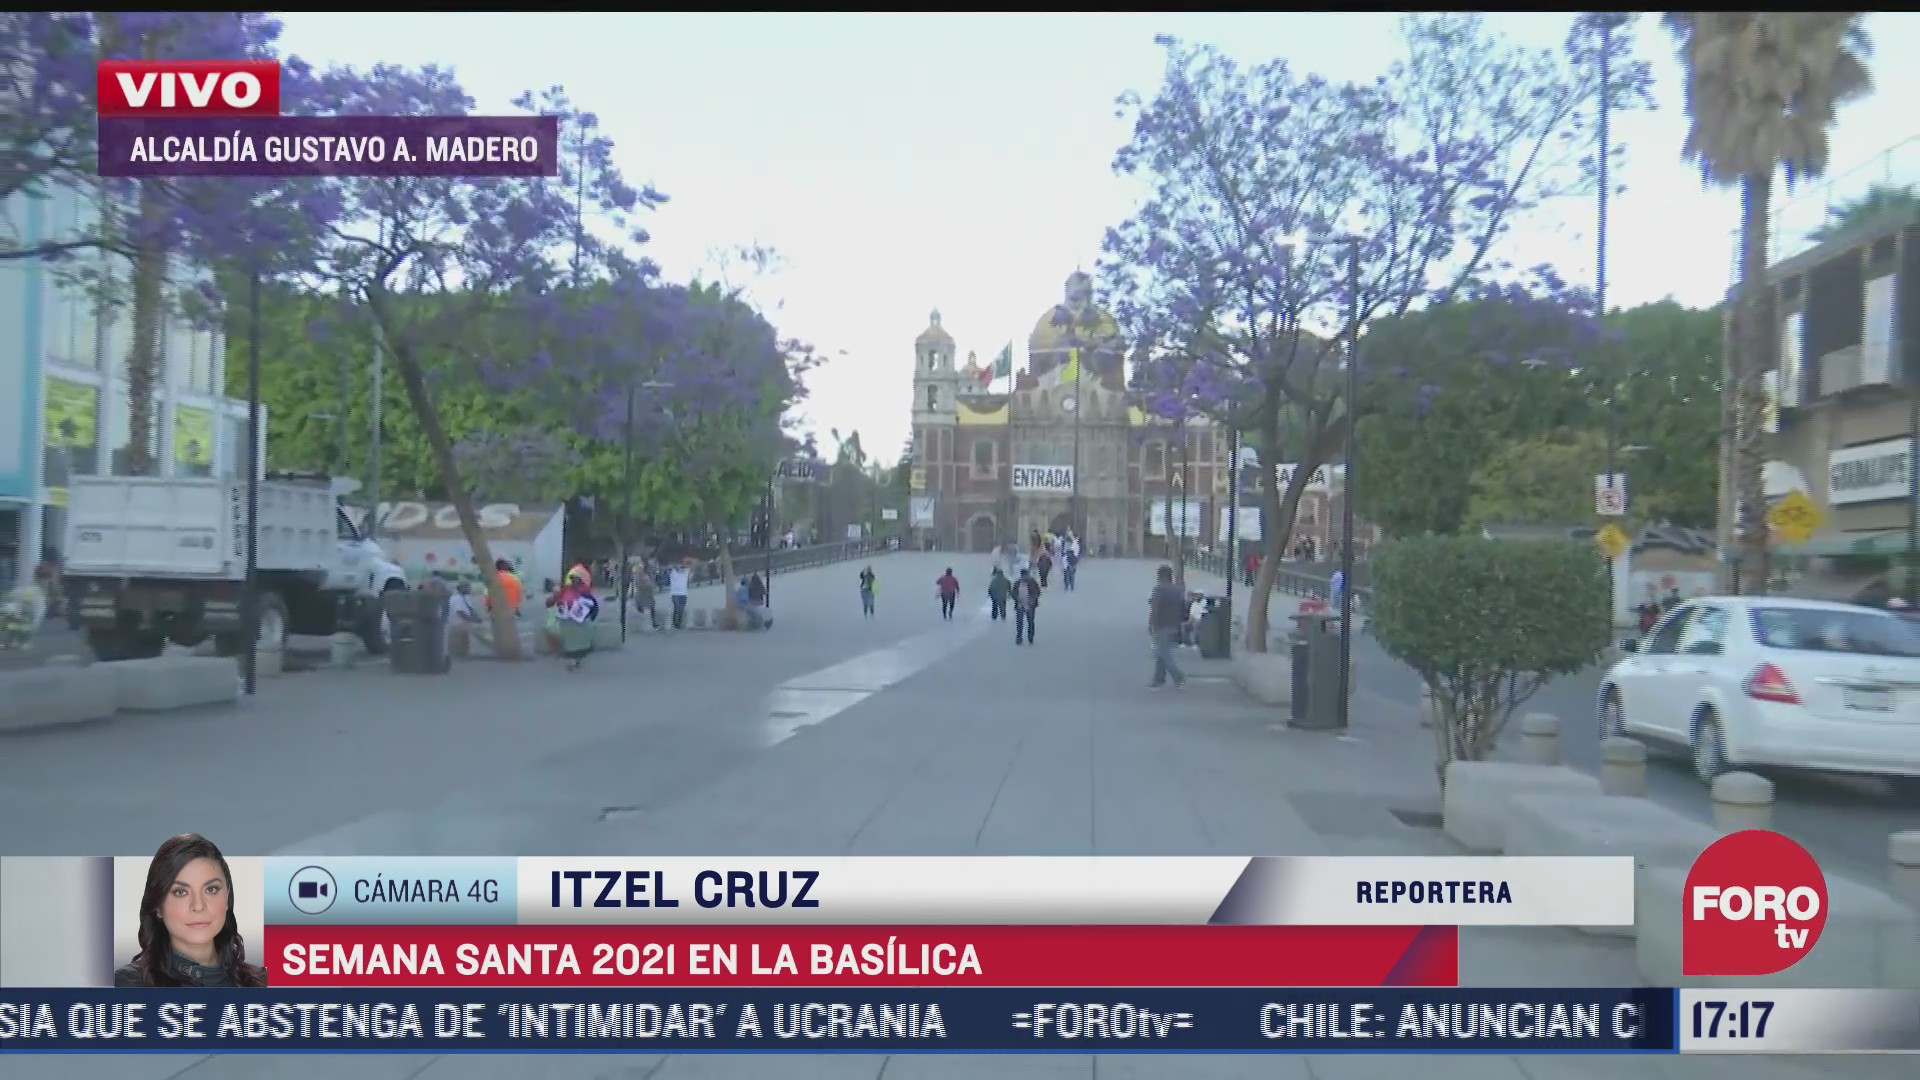 basilica de guadalupe con poca afluencia de personas pese a semana santa